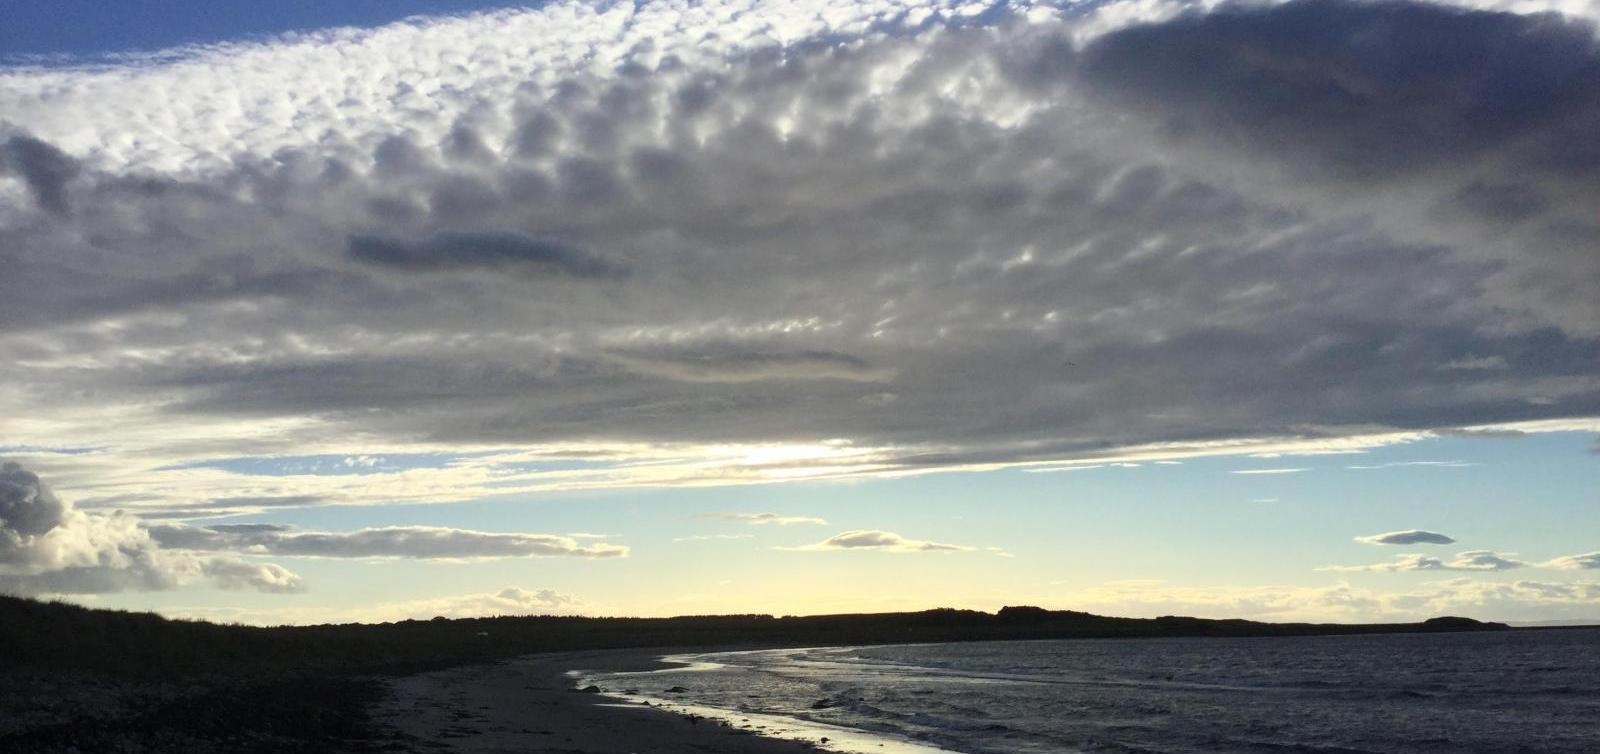 UK Weather - Westerly flow brings Atlantic rain but little will reach warm SE Britain.